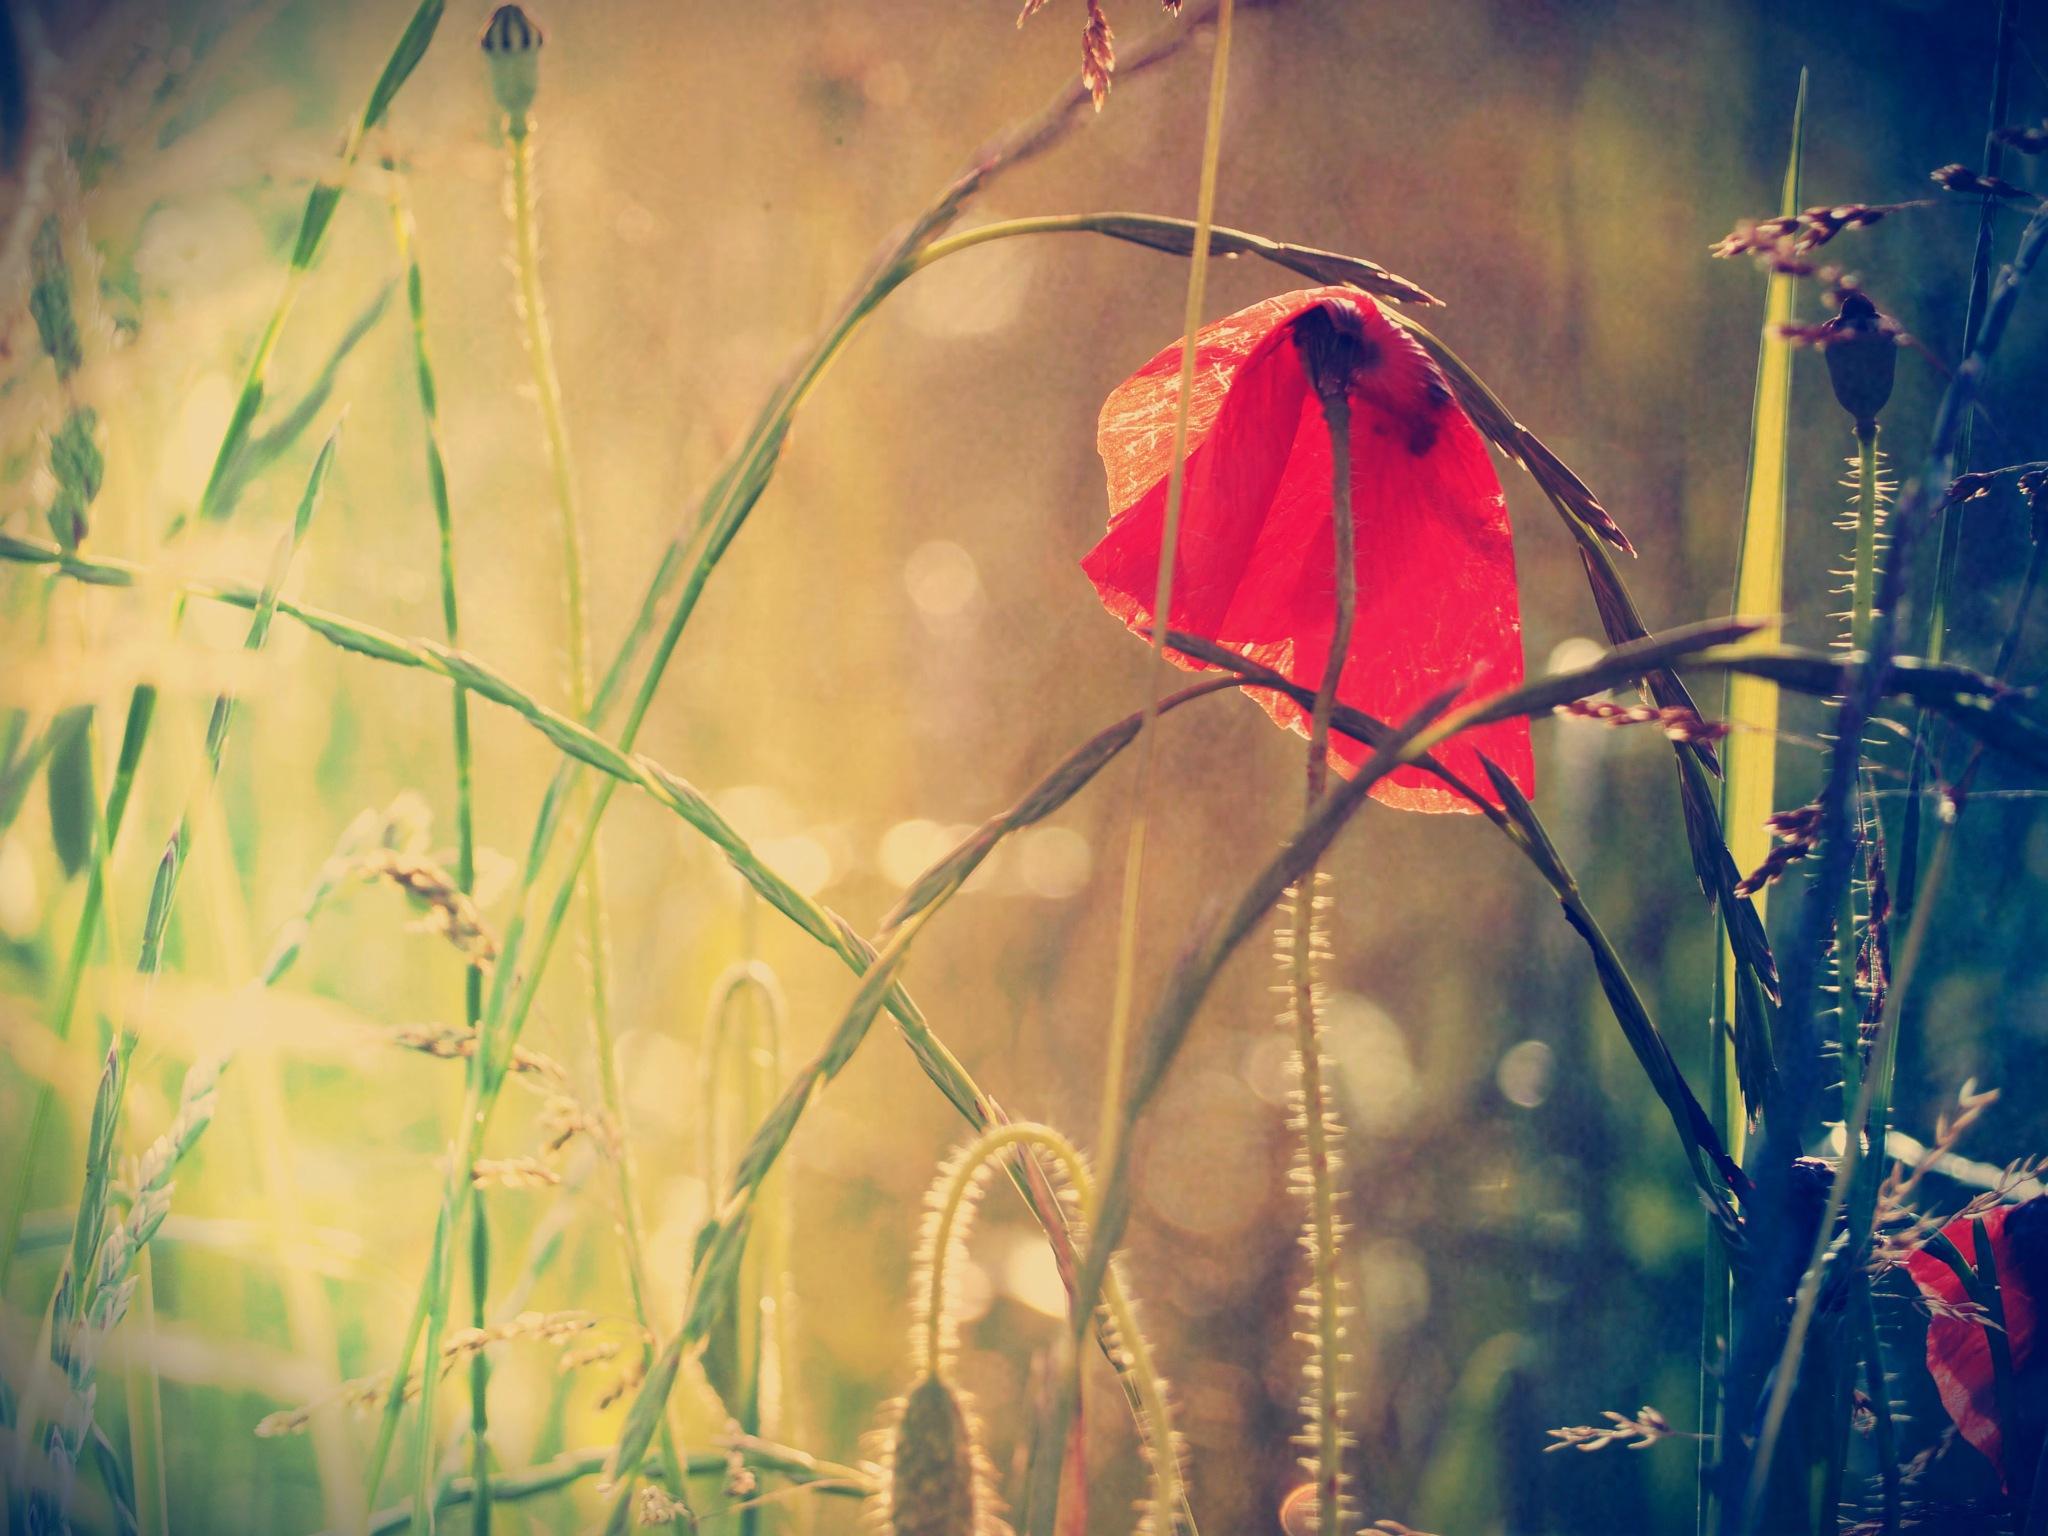 poppy by alain michel